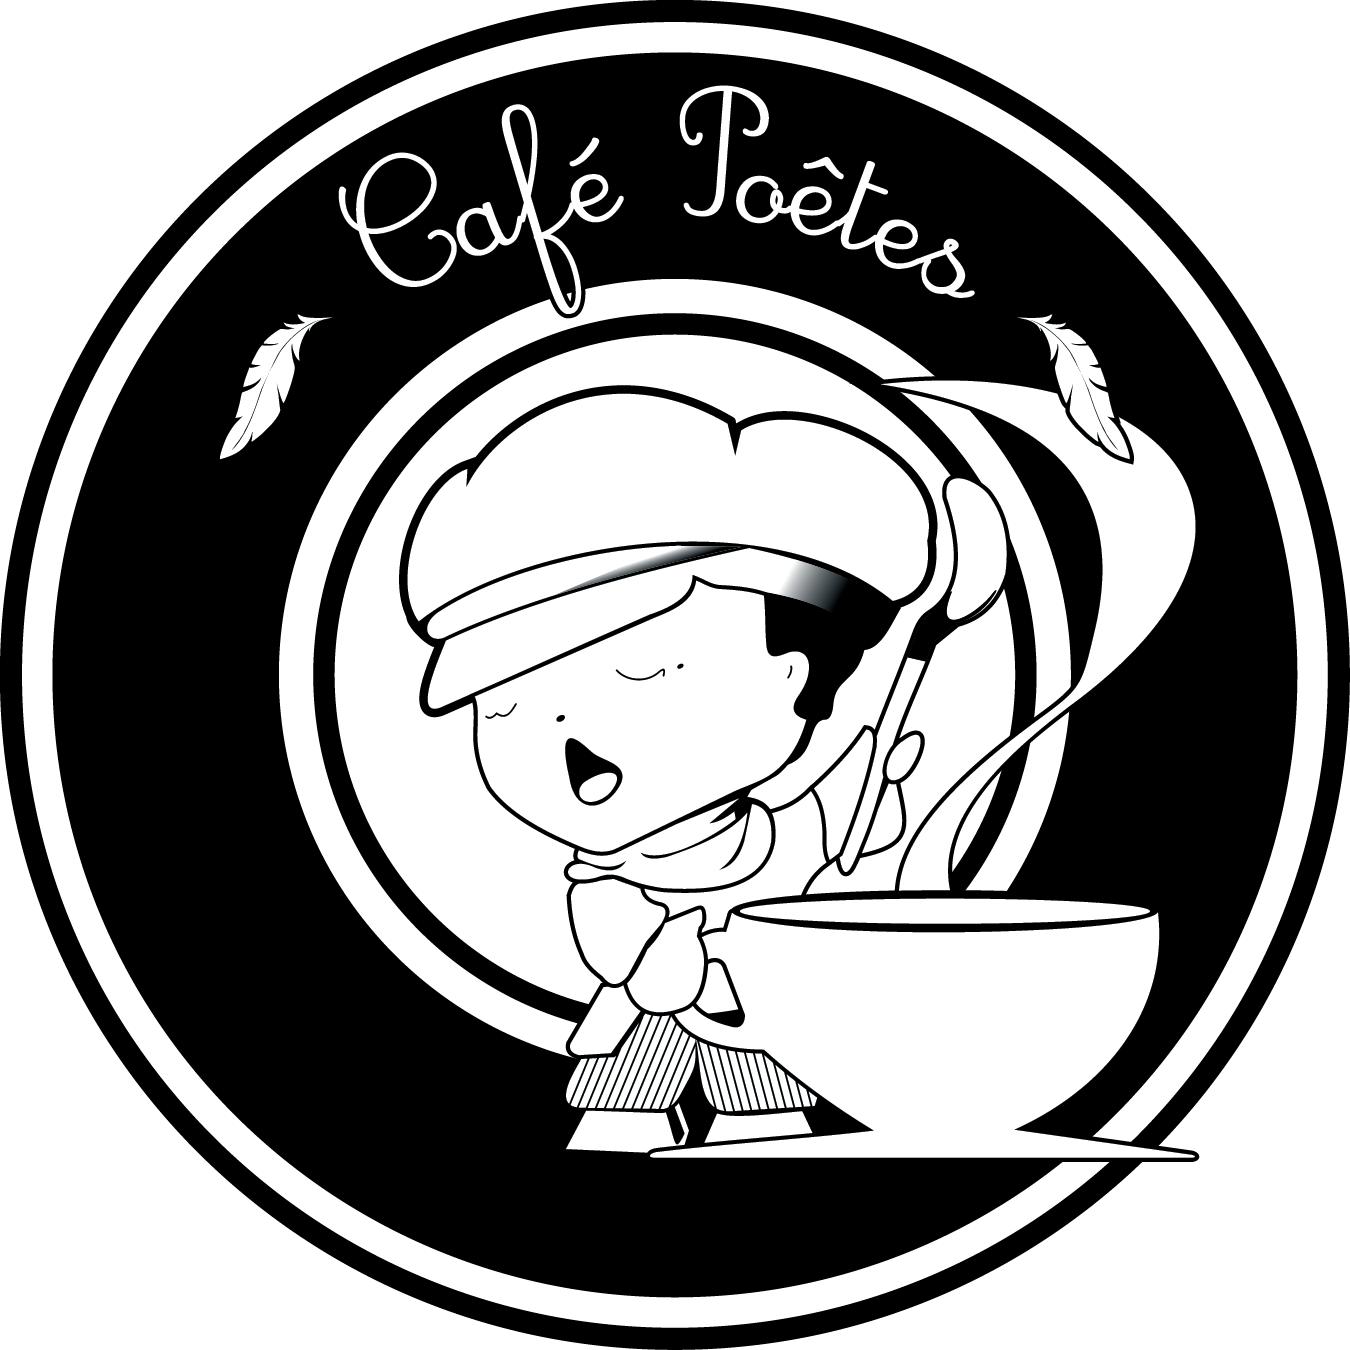 CAFE POETES